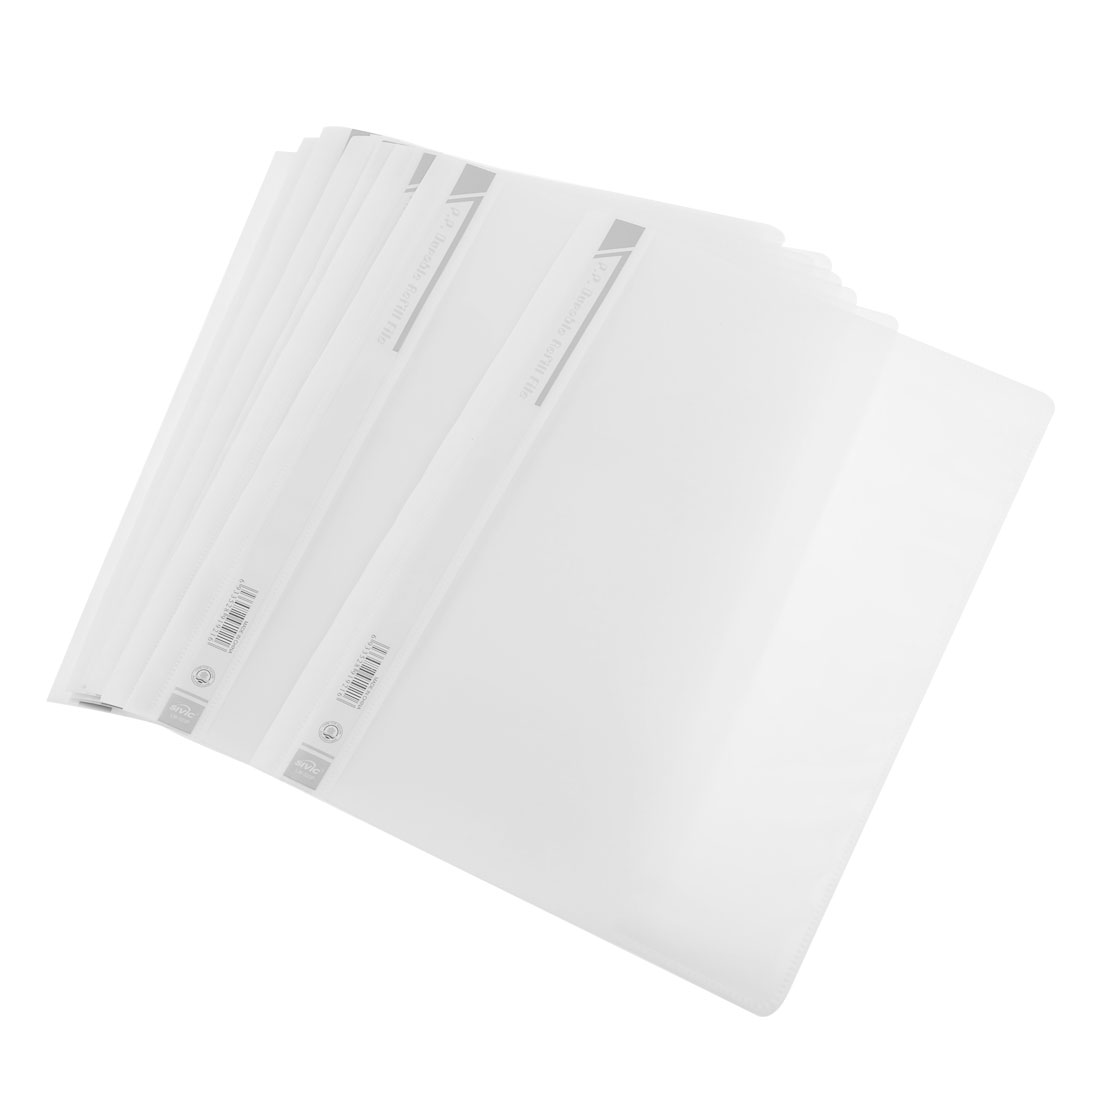 12 Pcs Size A4 Paper File Document Case Conference Folder White Clear